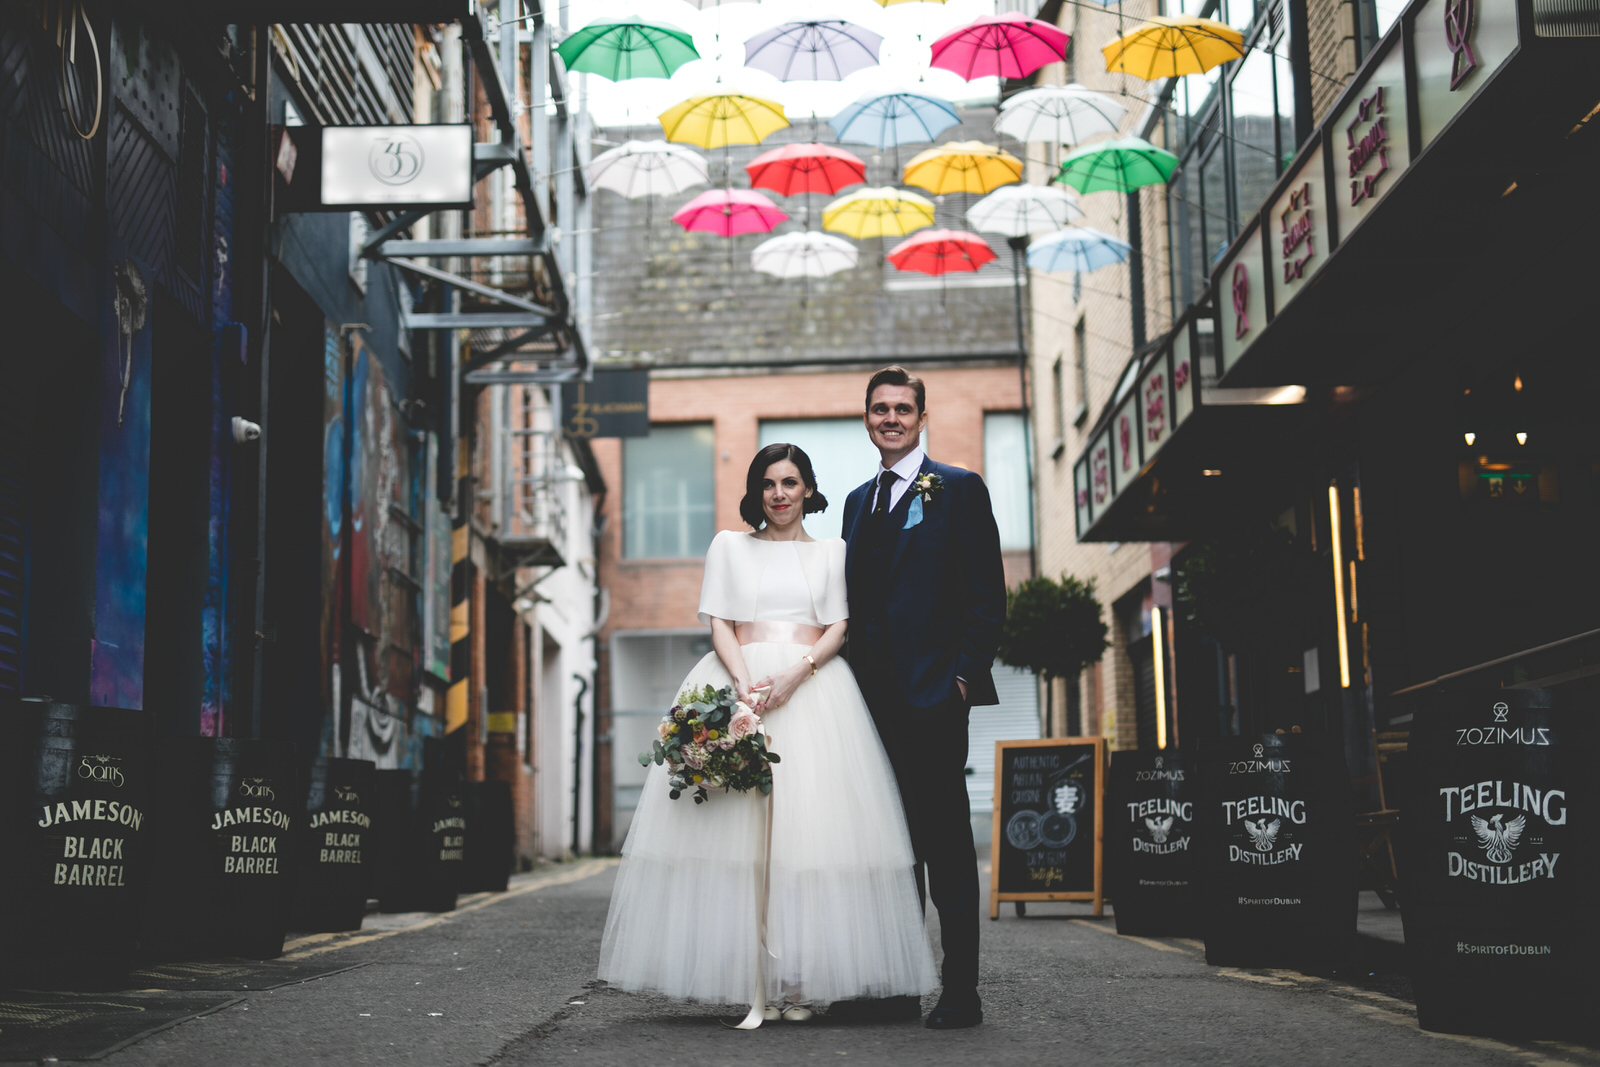 South Annes Lane Umbrella Installation & wedding photo